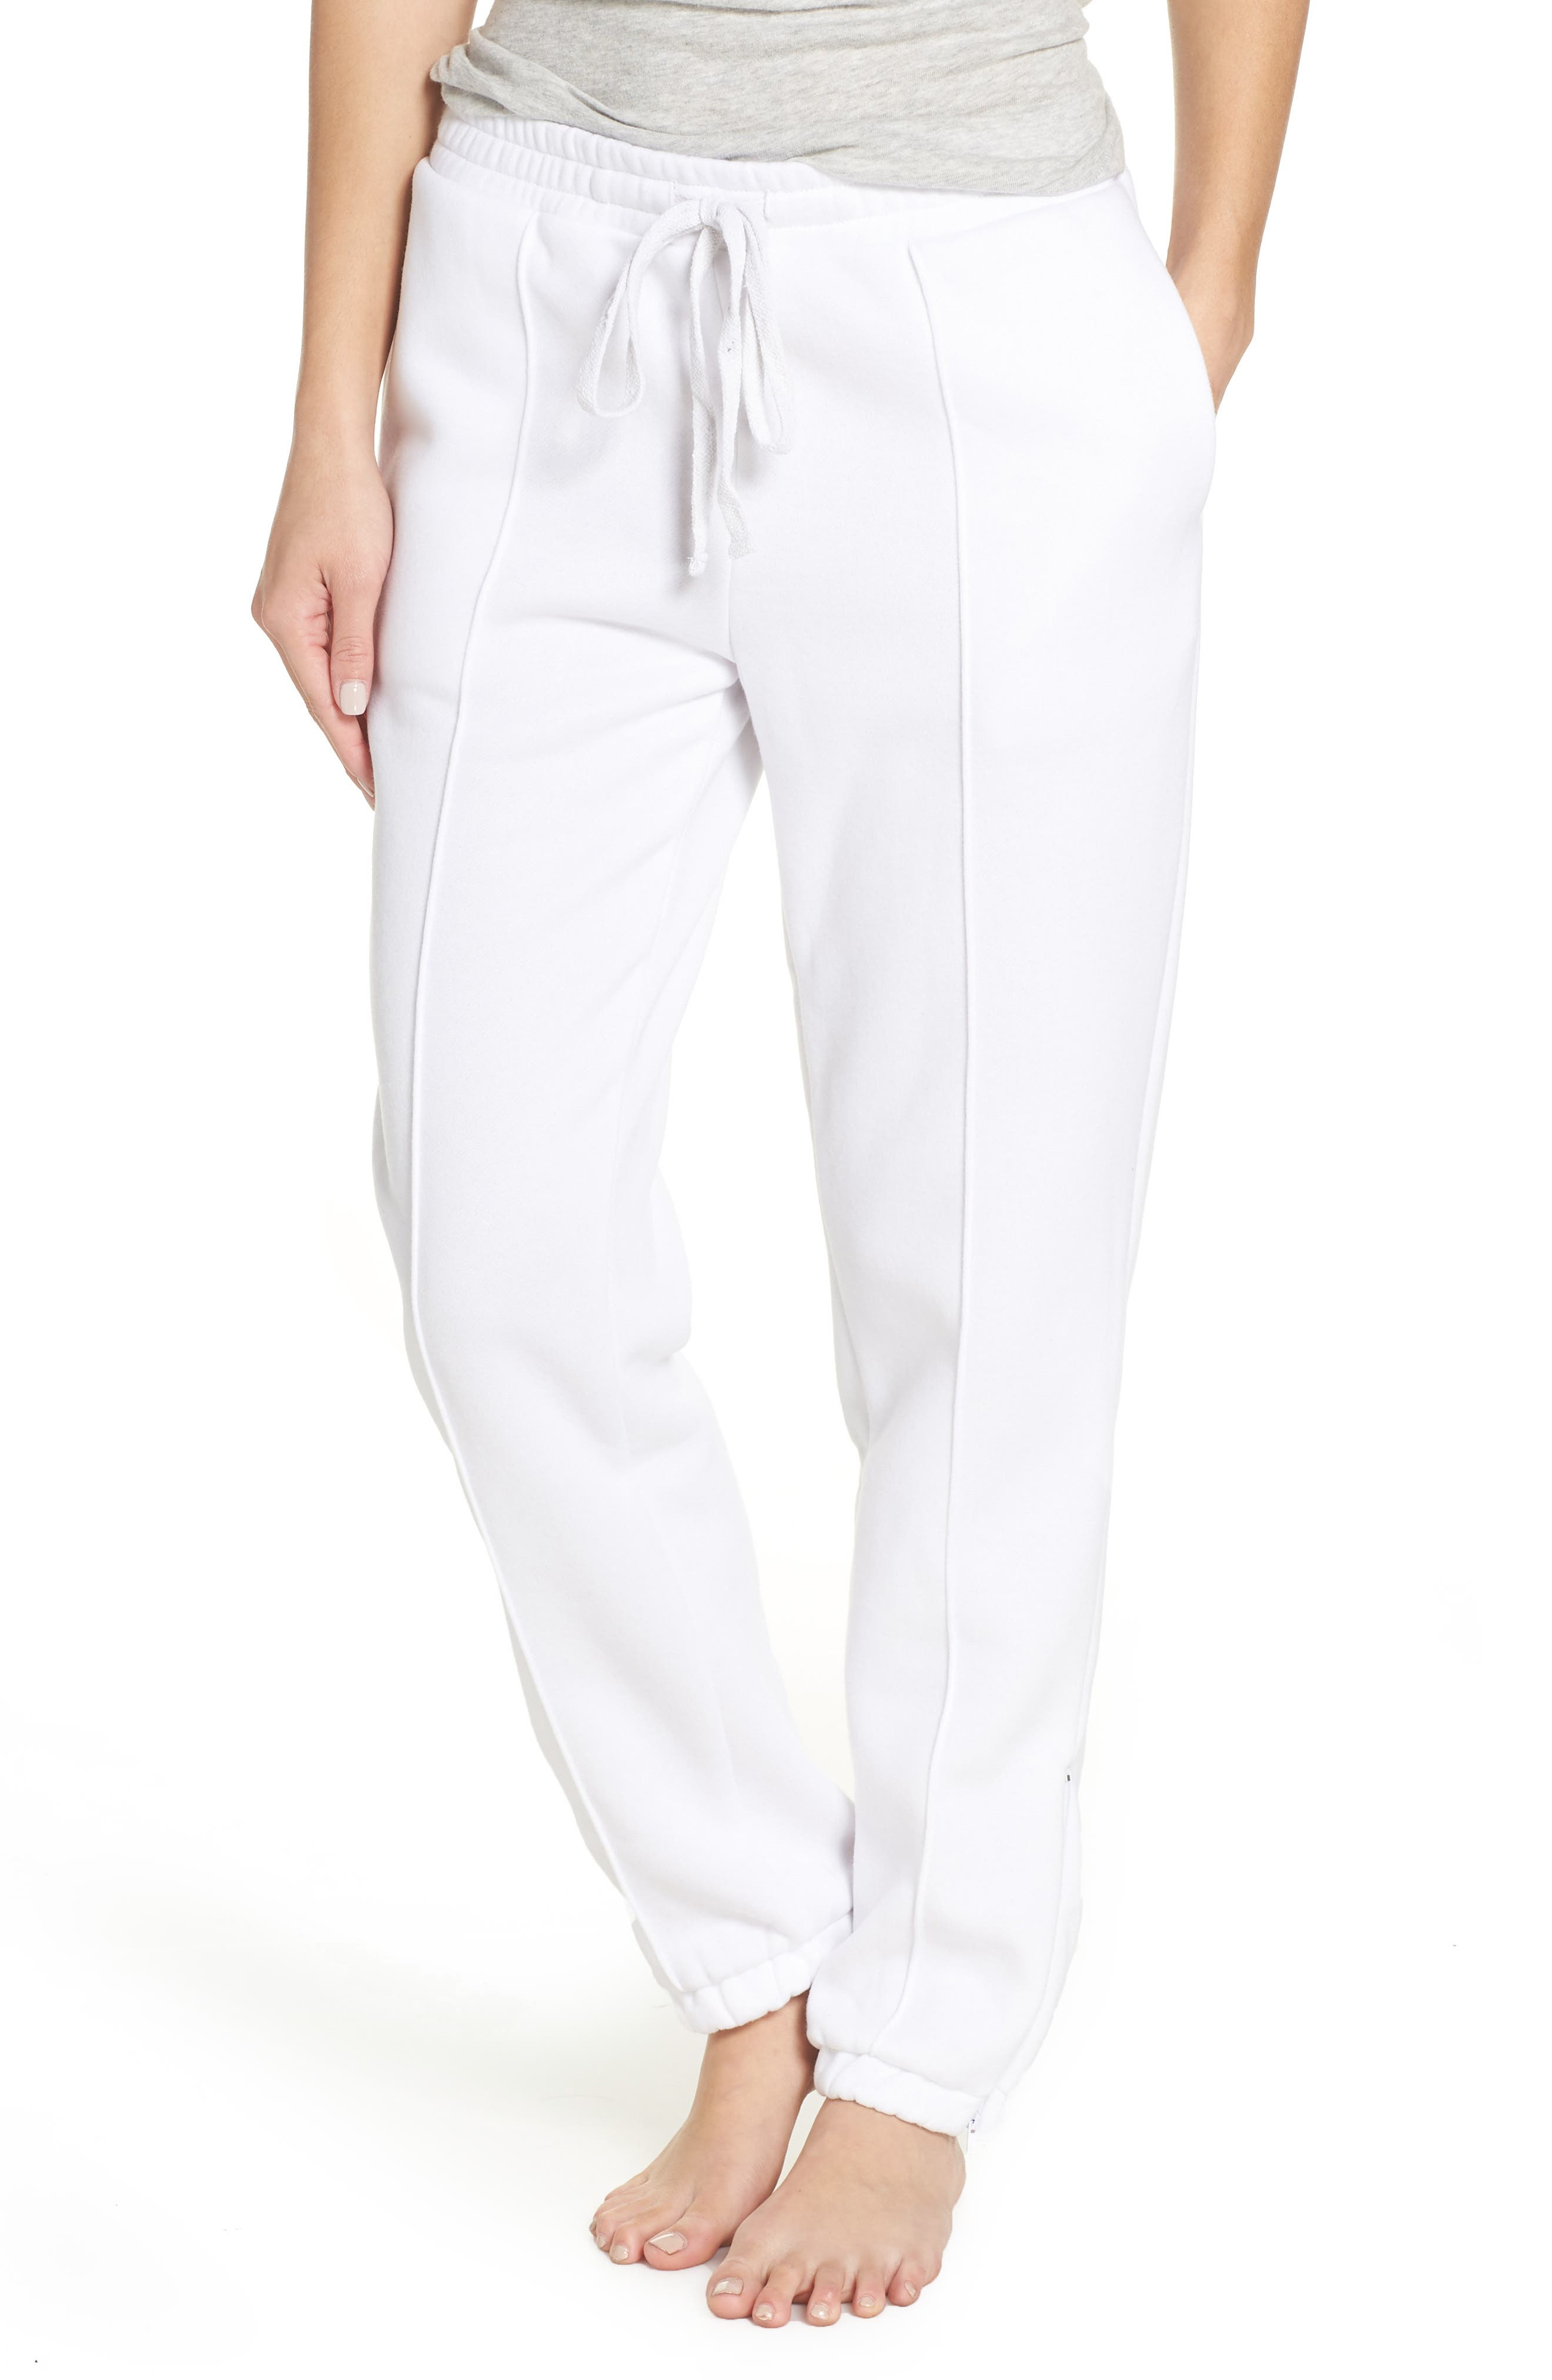 Hang Time Lounge Jogger Pants, Main, color, OPTIC WHITE